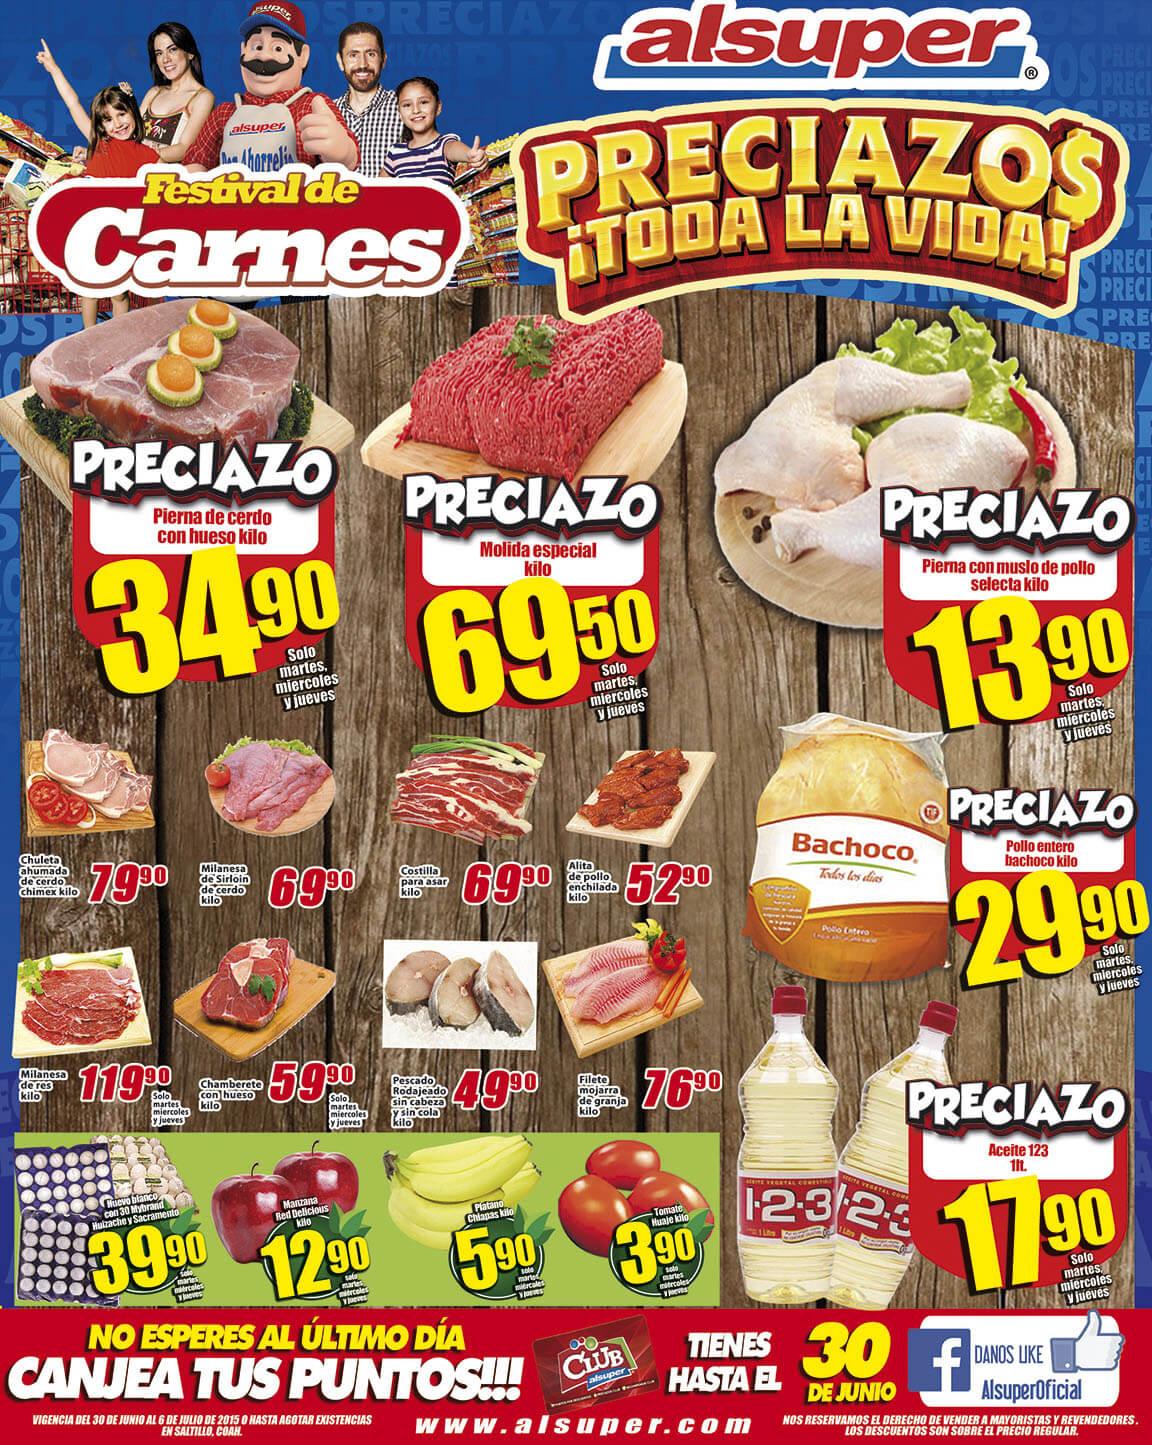 Alsuper: Festival de las carnes [Molida especial $69 kg, Agua Nestle 4Lts $8.90 y mas...]